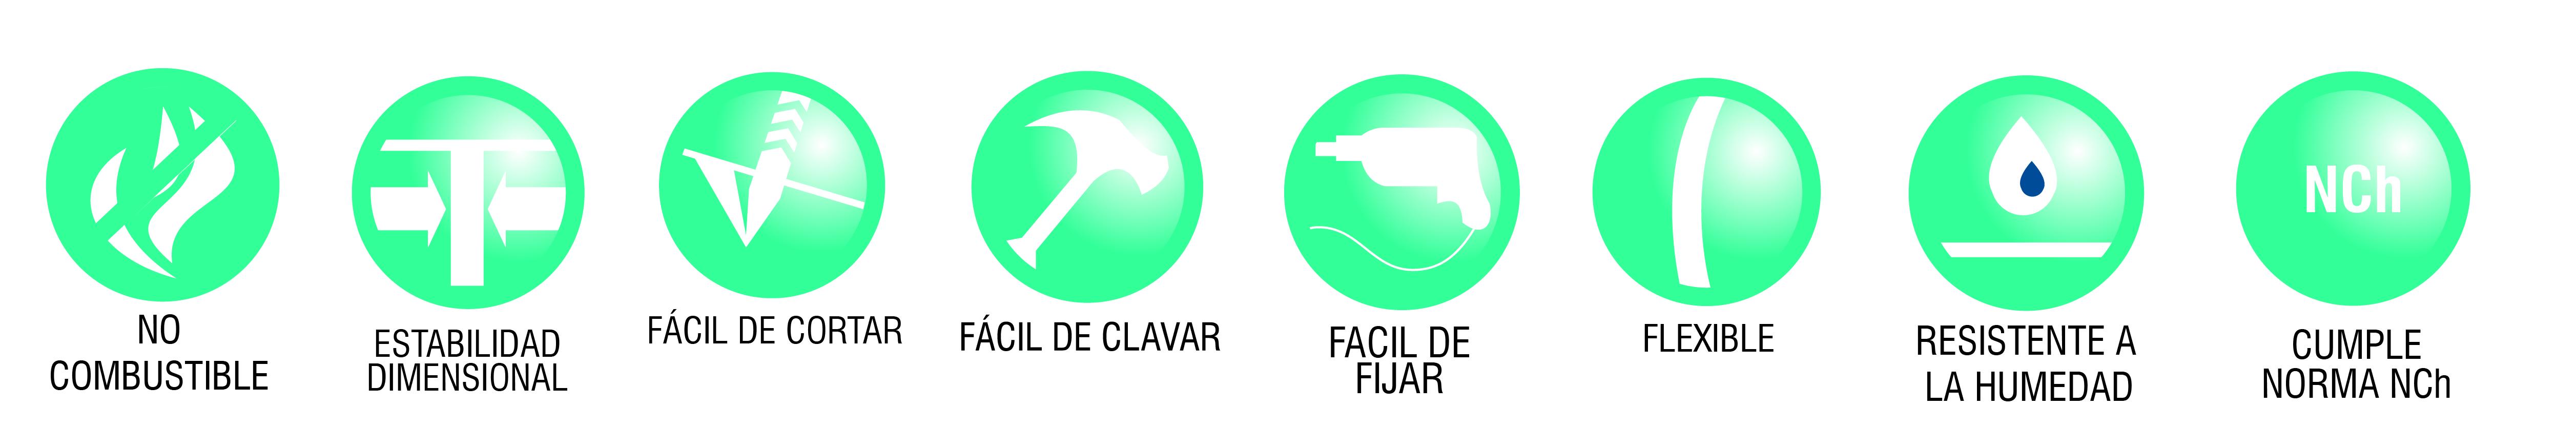 iconos ventajas volcansiding fibrocemento